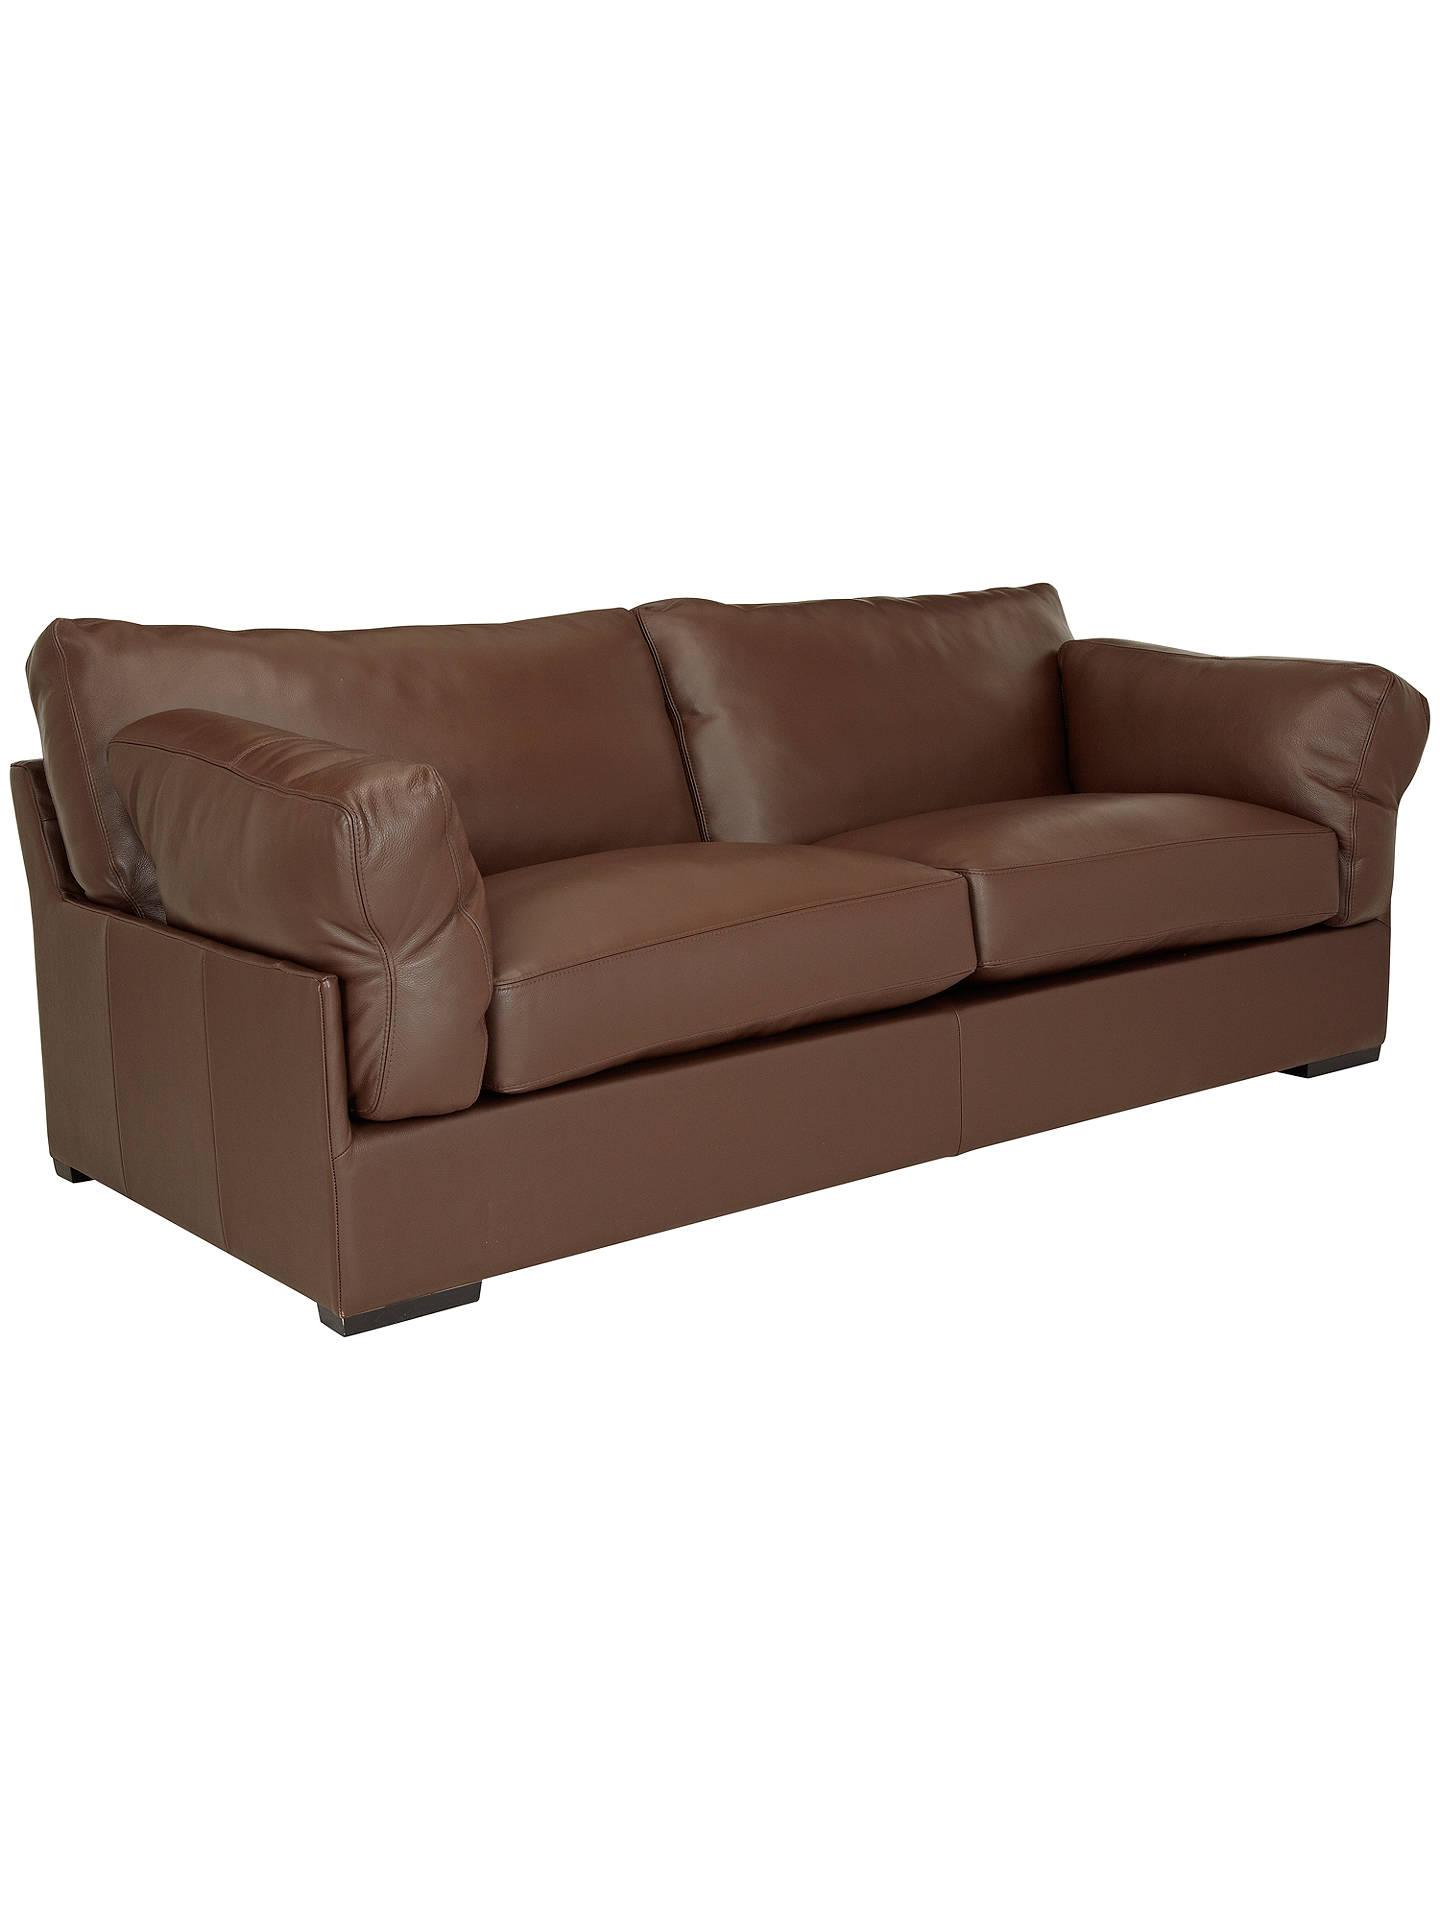 Awe Inspiring John Lewis Partners Java Leather Grand 4 Seater Sofa Cjindustries Chair Design For Home Cjindustriesco